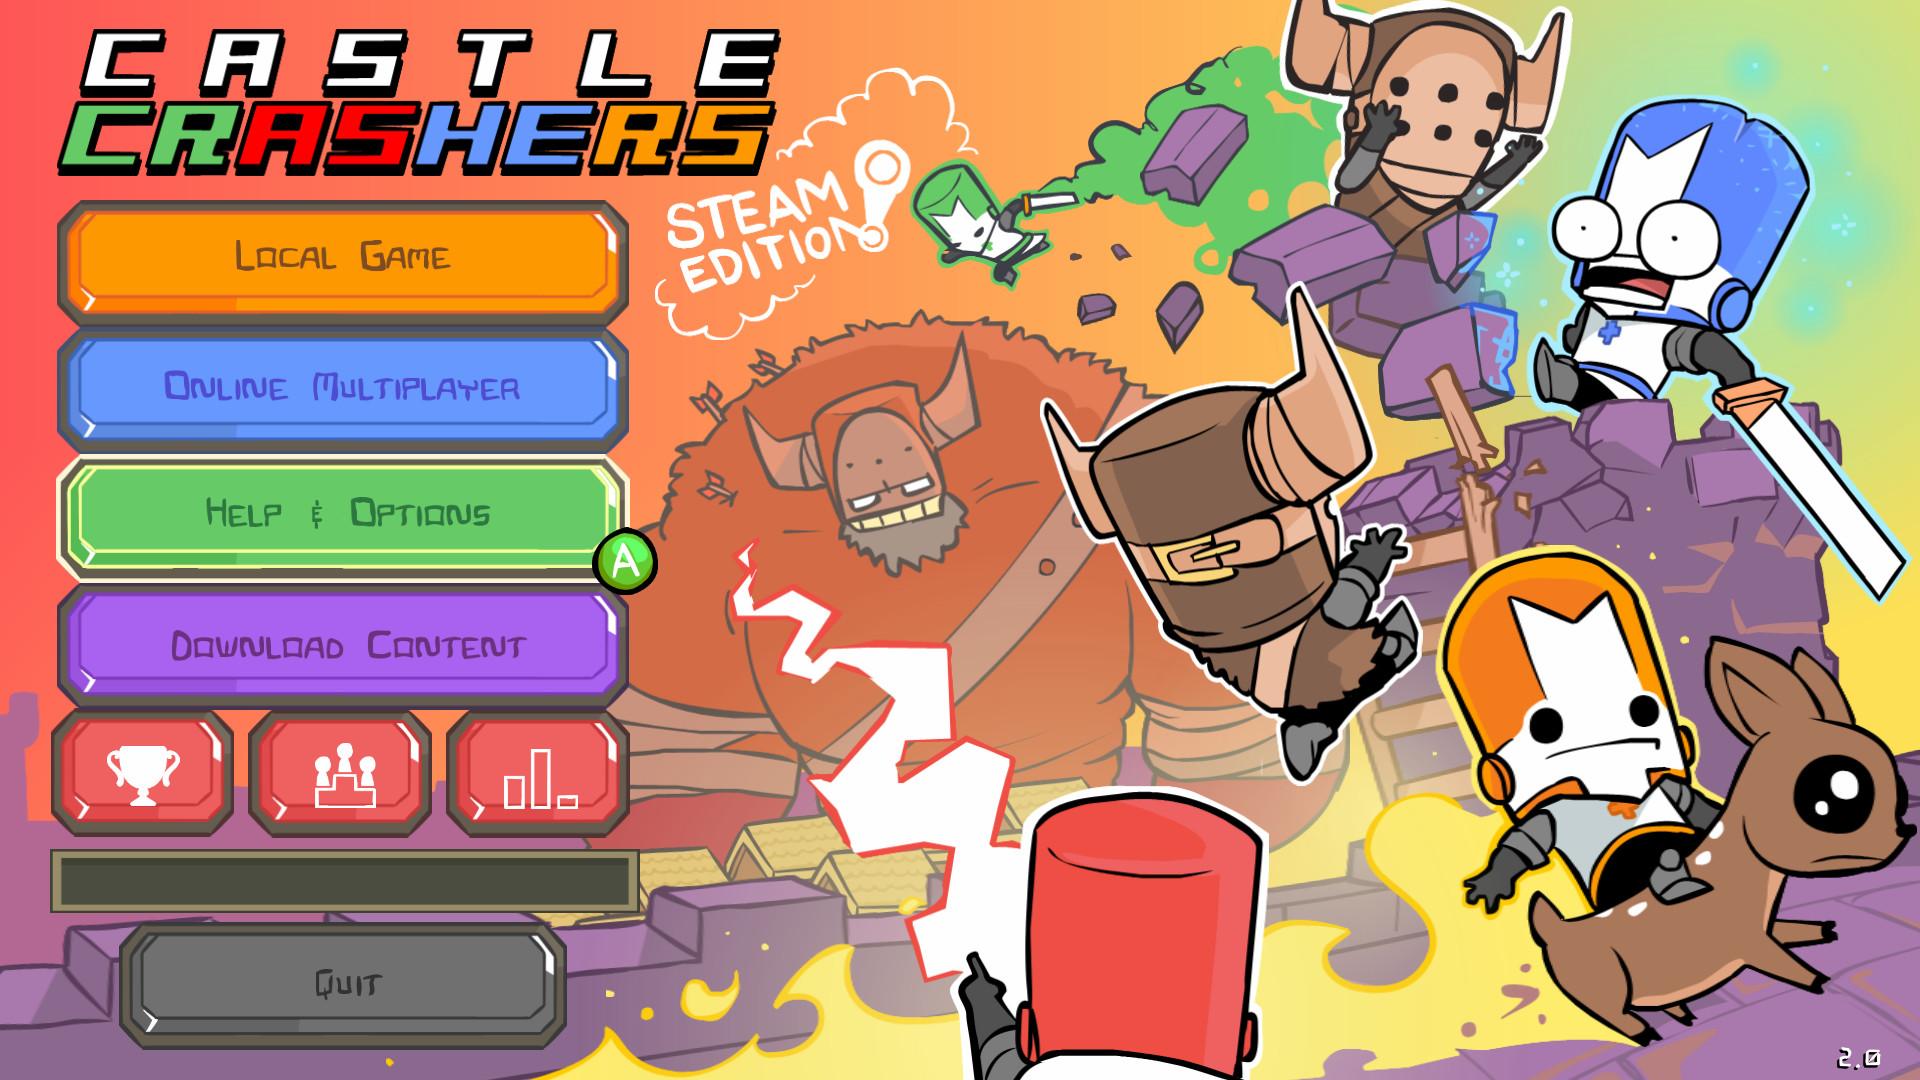 Find the best laptop for Castle Crashers